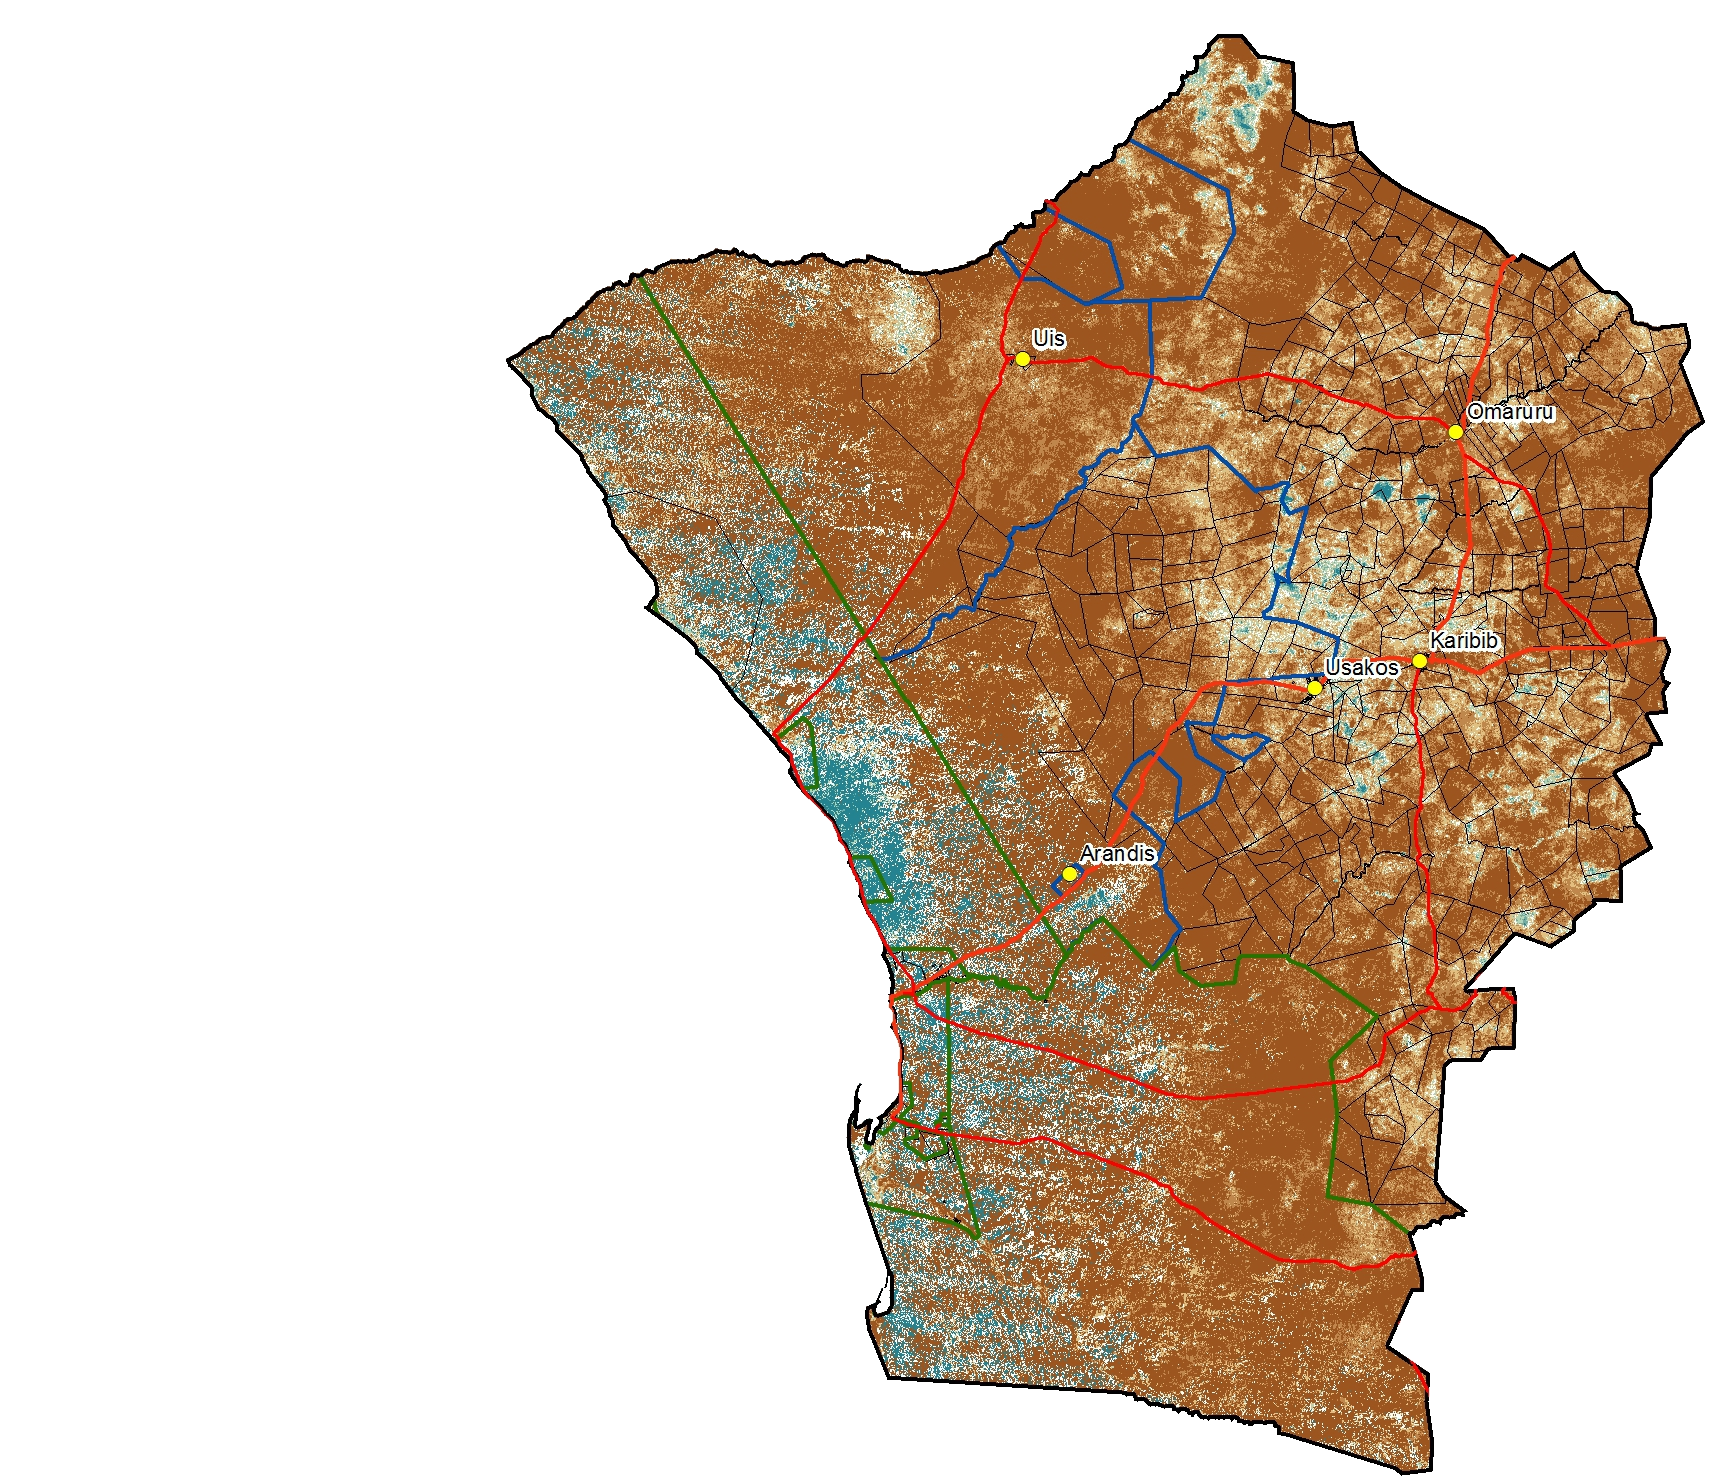 Namibia Rangelands Portal For Rangelands Condition Maps - Namibia map